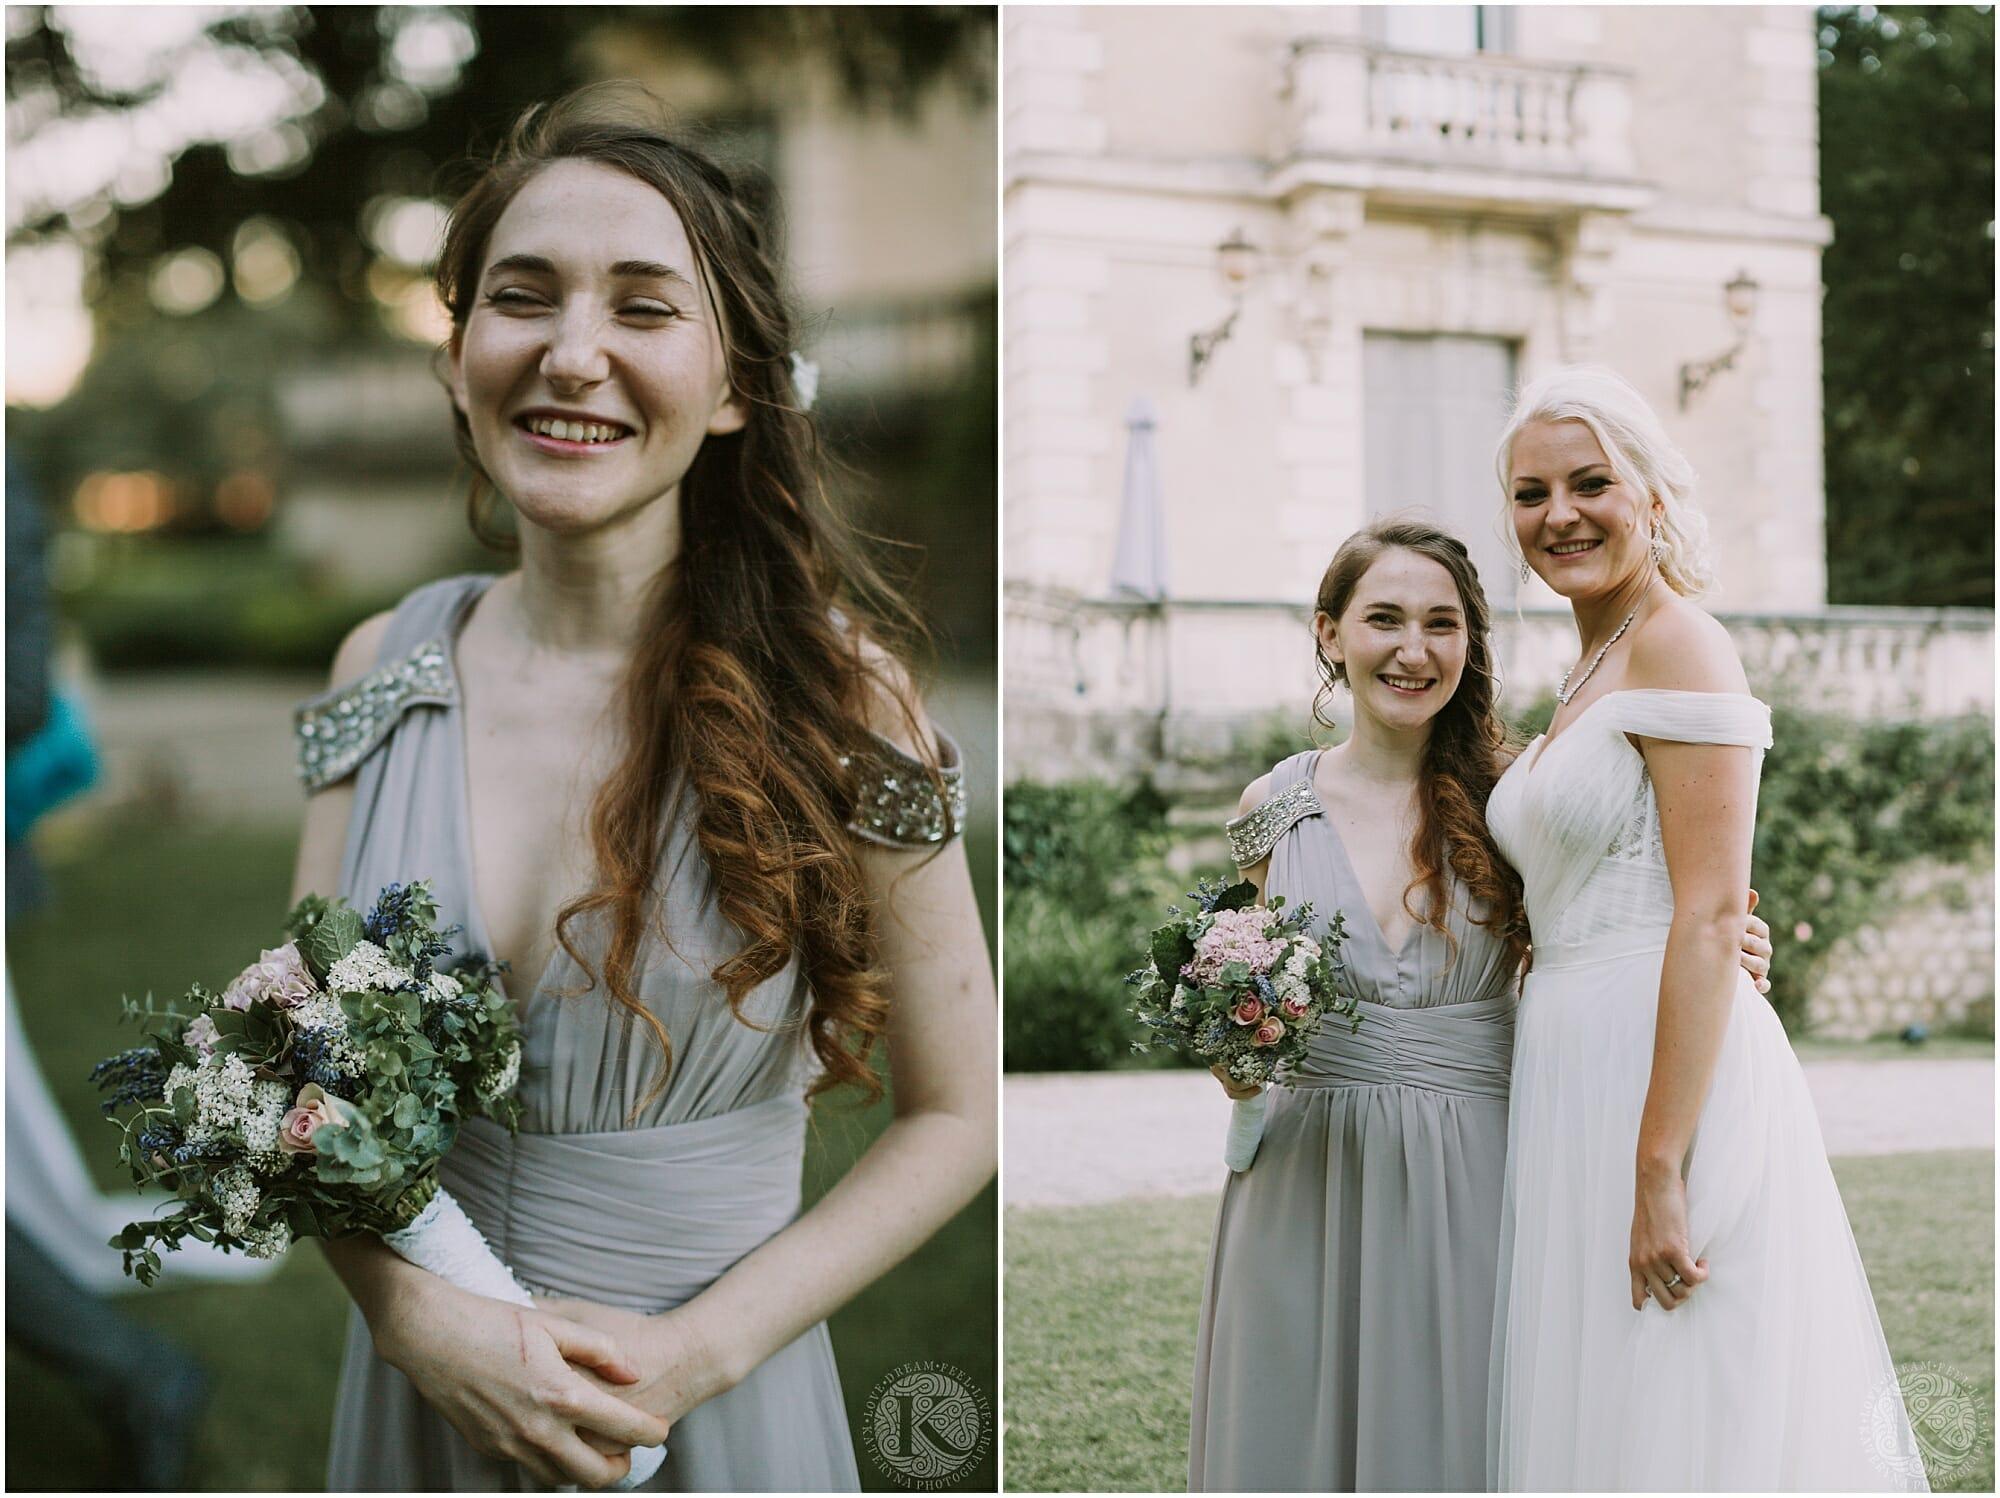 Kateryna-photos-photographe-mariage-chateau-des-3-fontaines-provence-avignon-vaucluse-sud_0082.jpg